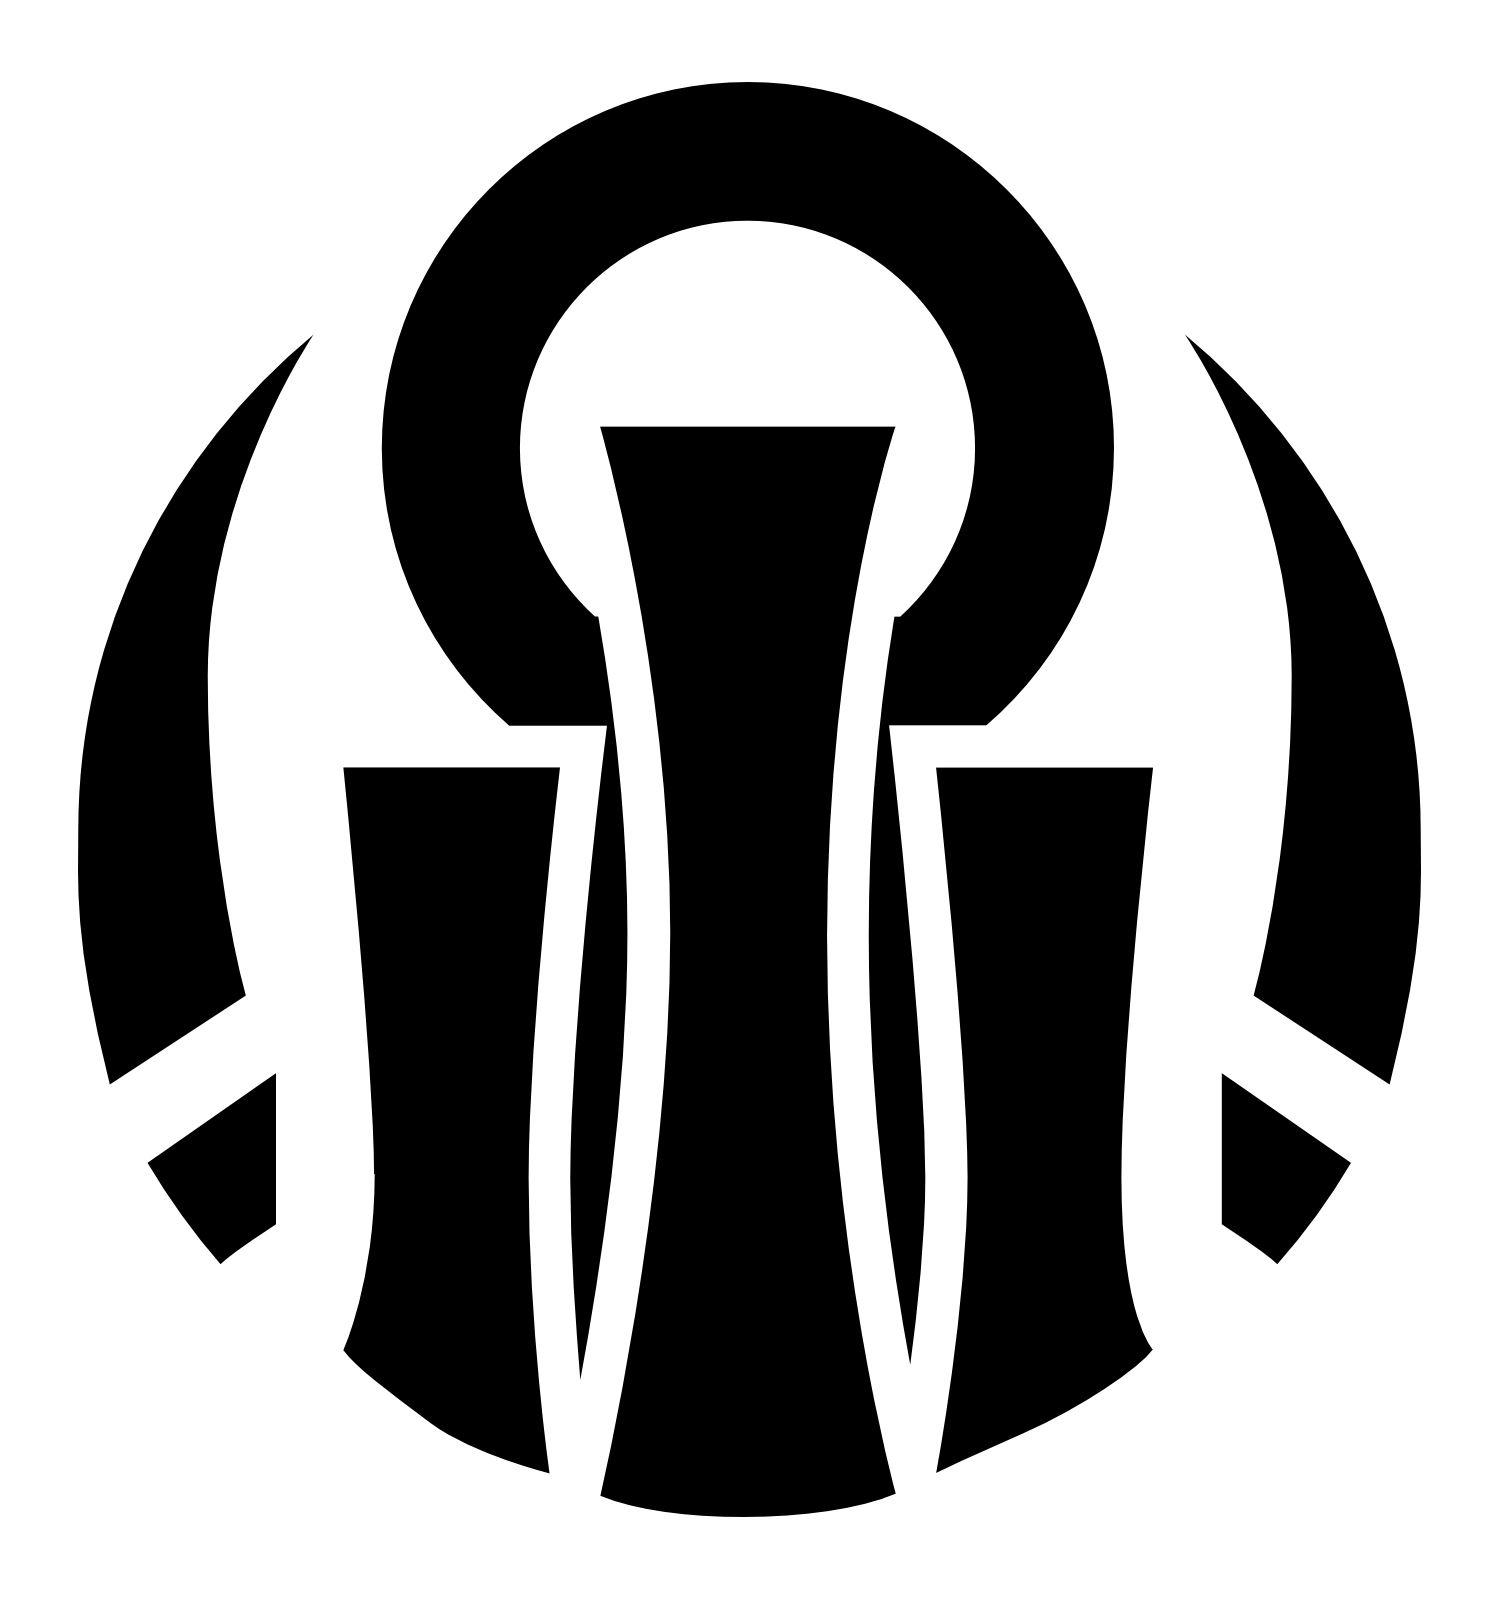 nosgoth community day - nosgoth